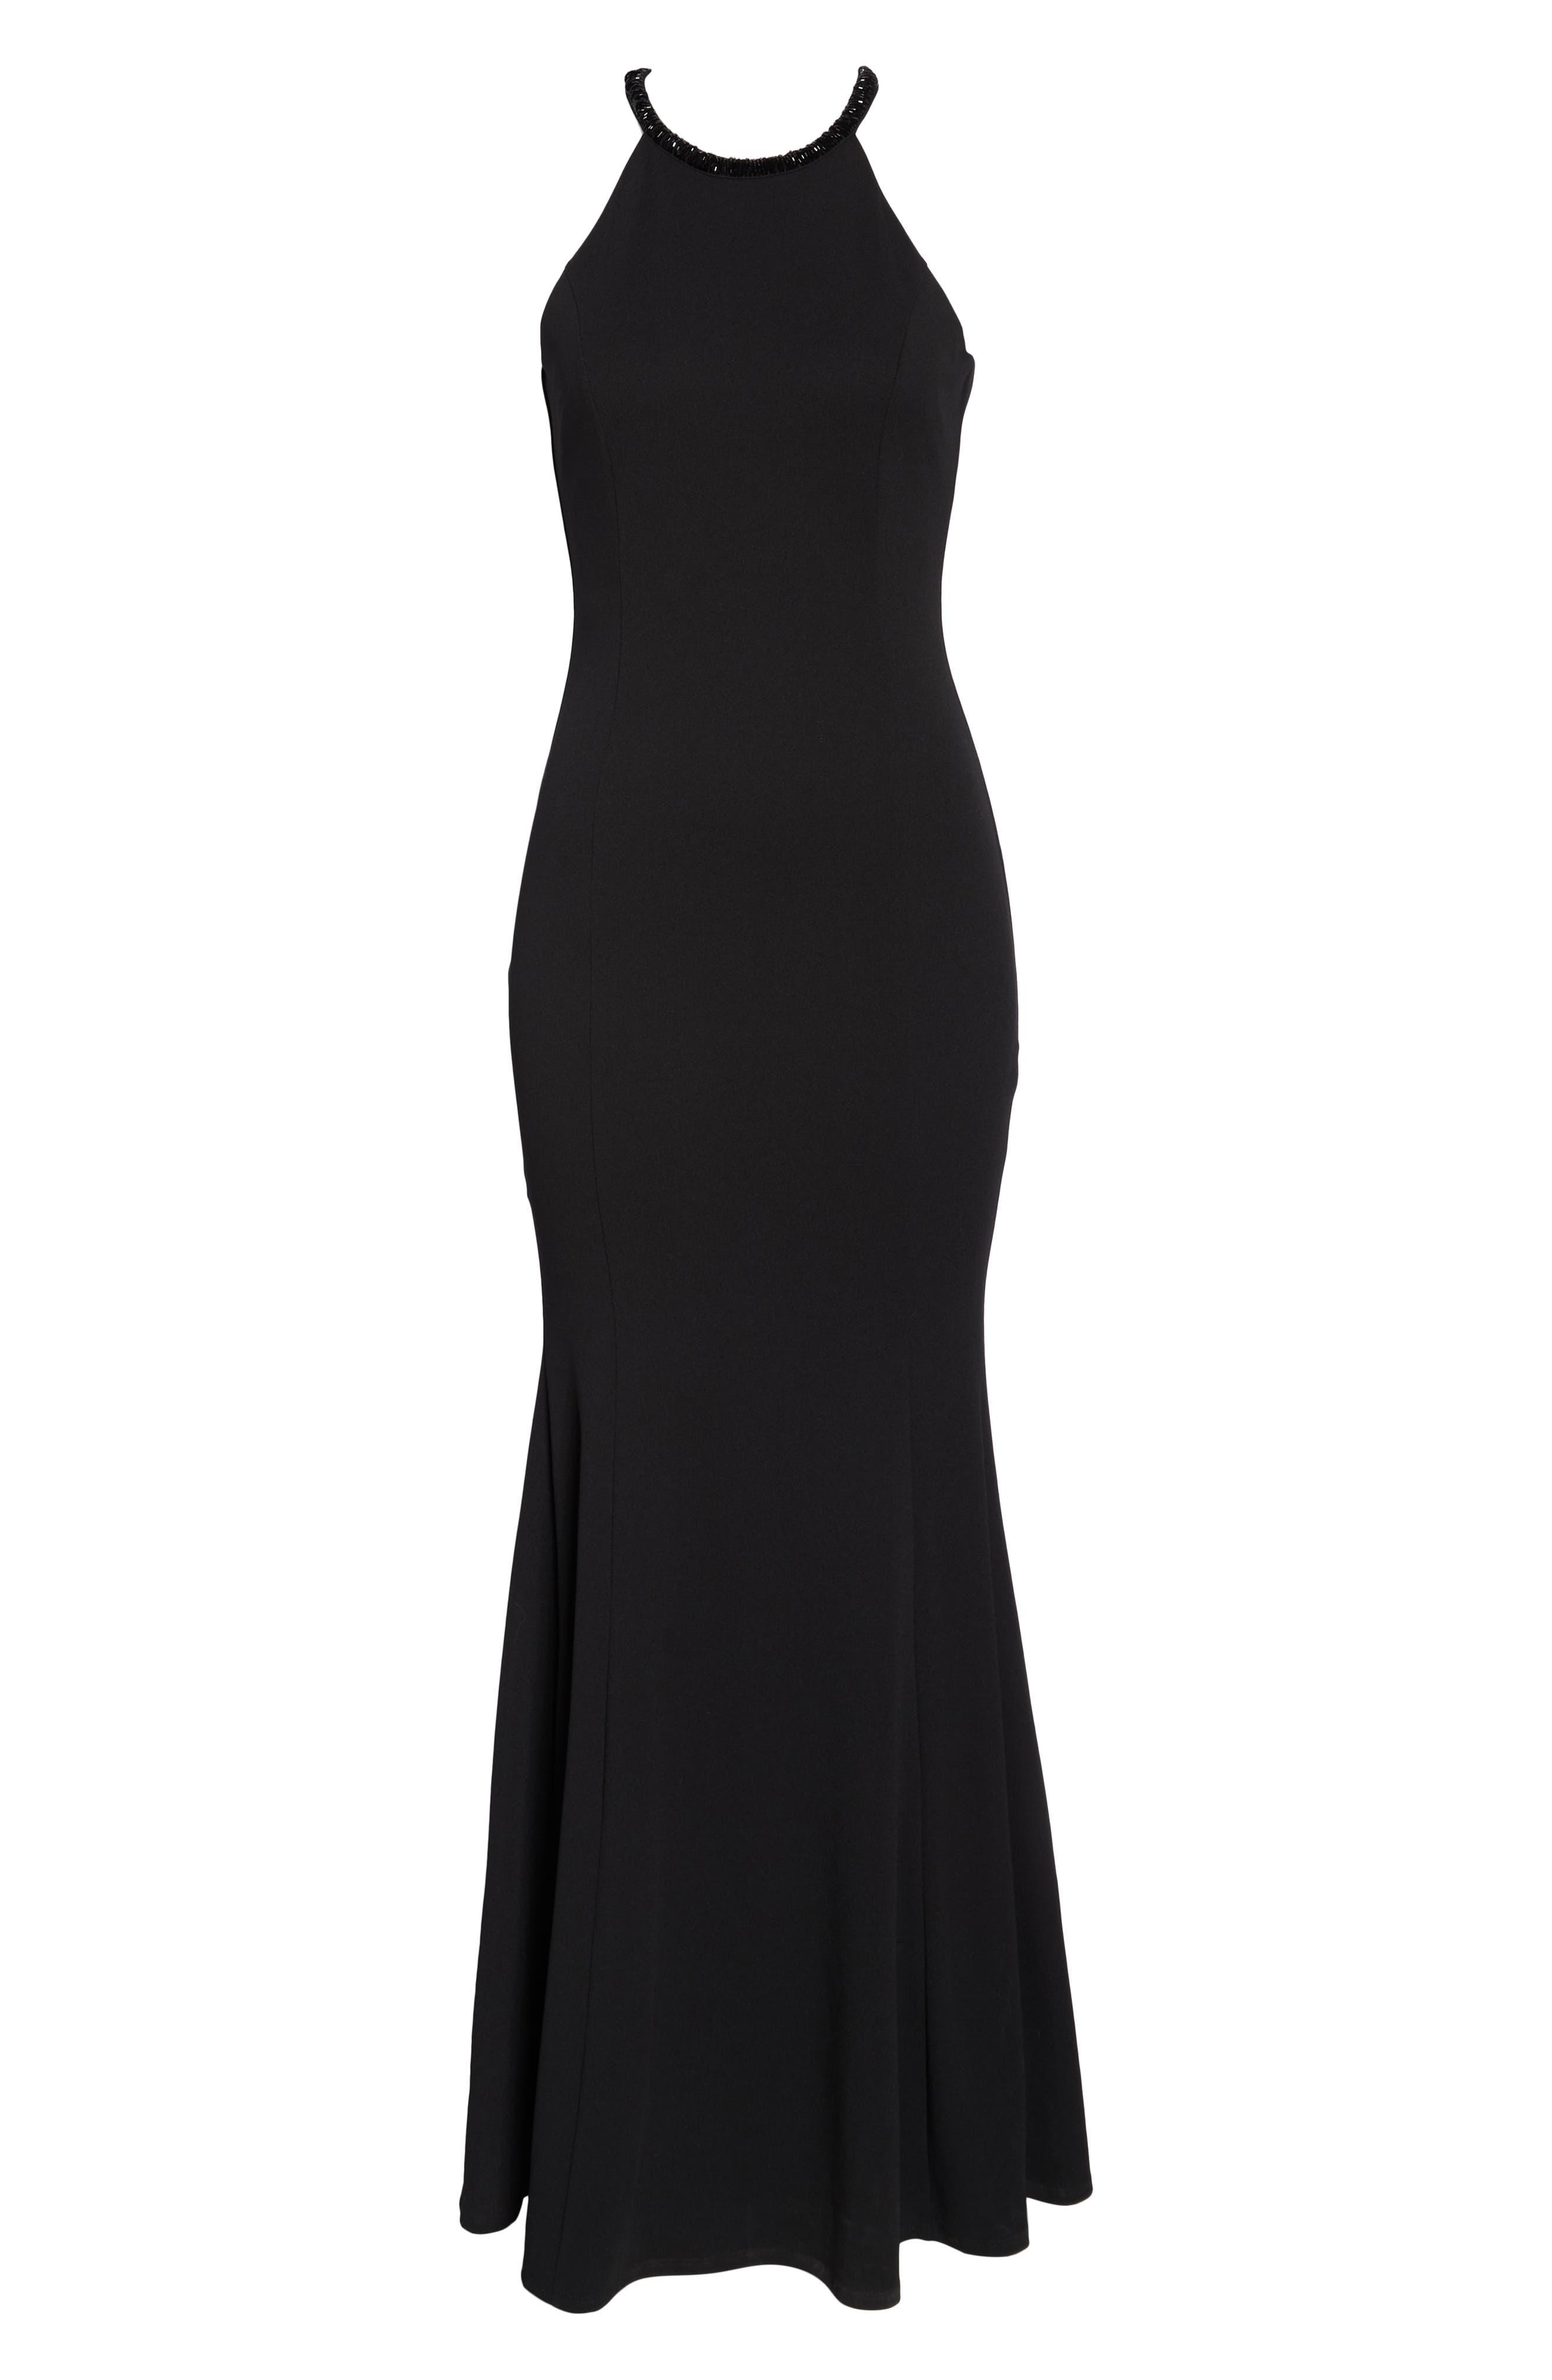 LULUS, Bead Neck Mermaid Gown, Alternate thumbnail 7, color, BLACK